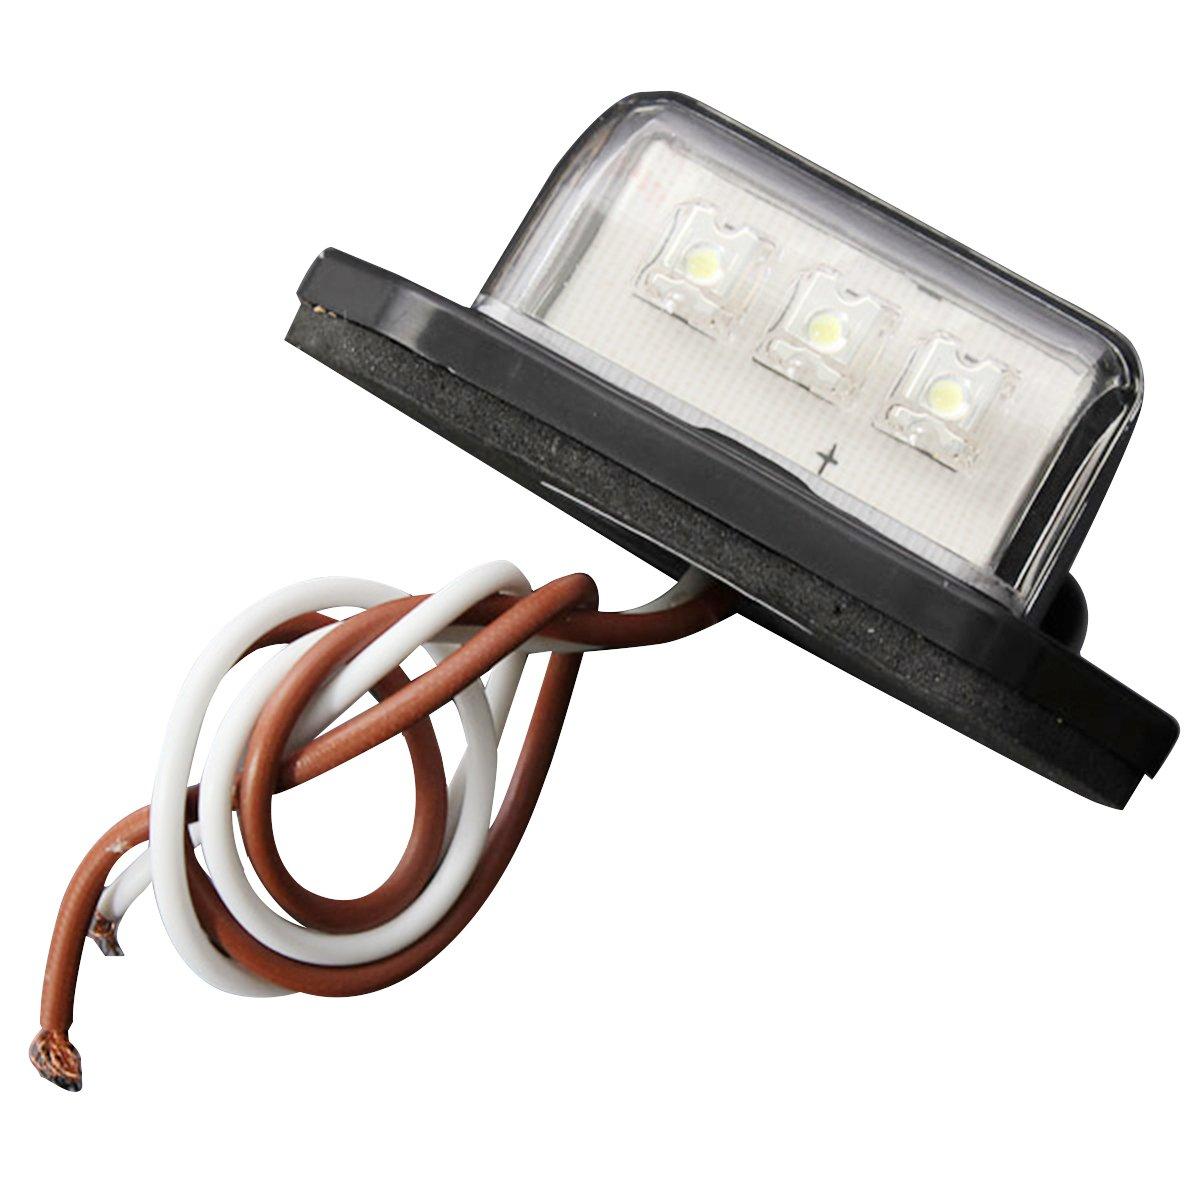 Luz de placa de matricula de coche - SODIAL(R)12/24V 3 LED Luz de etiquetade matricula de coche Lampara de paso interior del camion remolque RV barco 062265